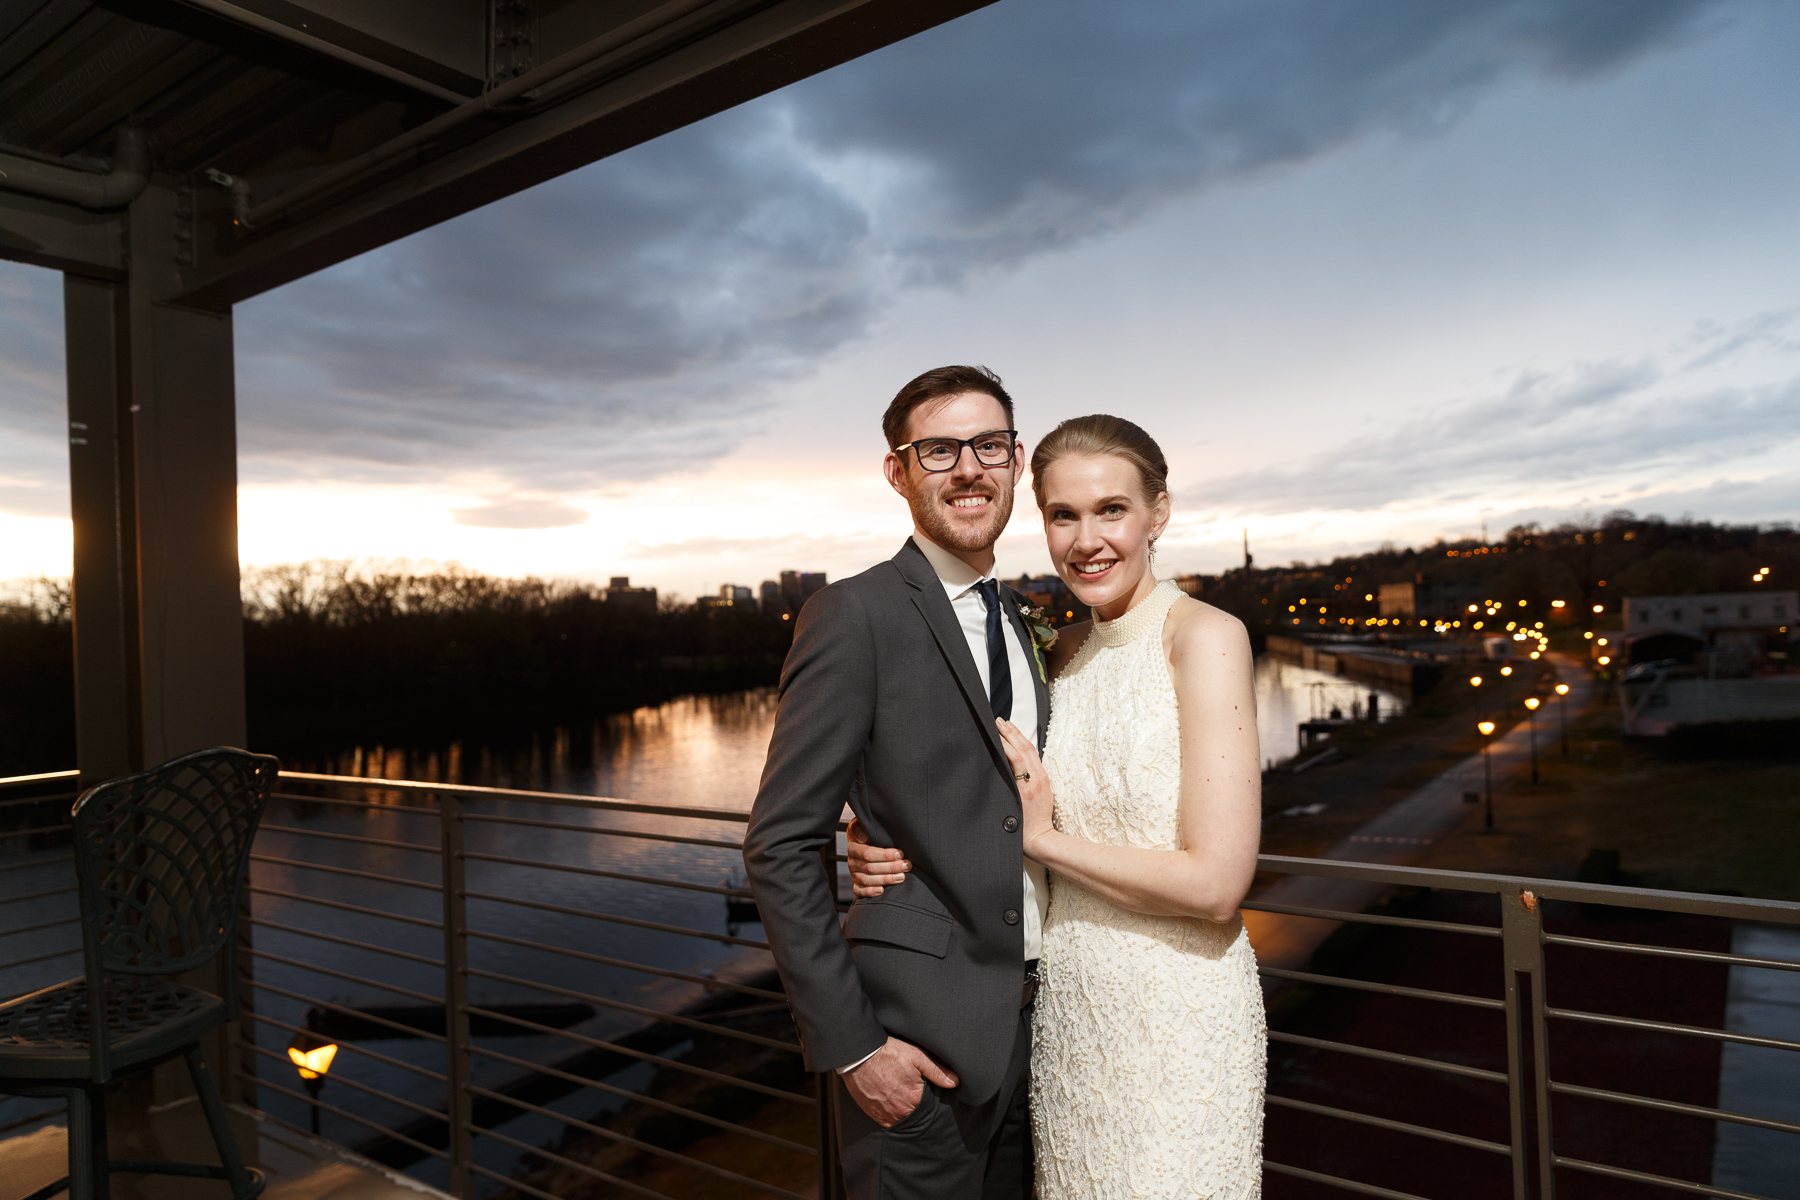 Jimmy Amanda Kelly Wedding_  Jonathan Heisler  _ _3182017 _ 851.jpg